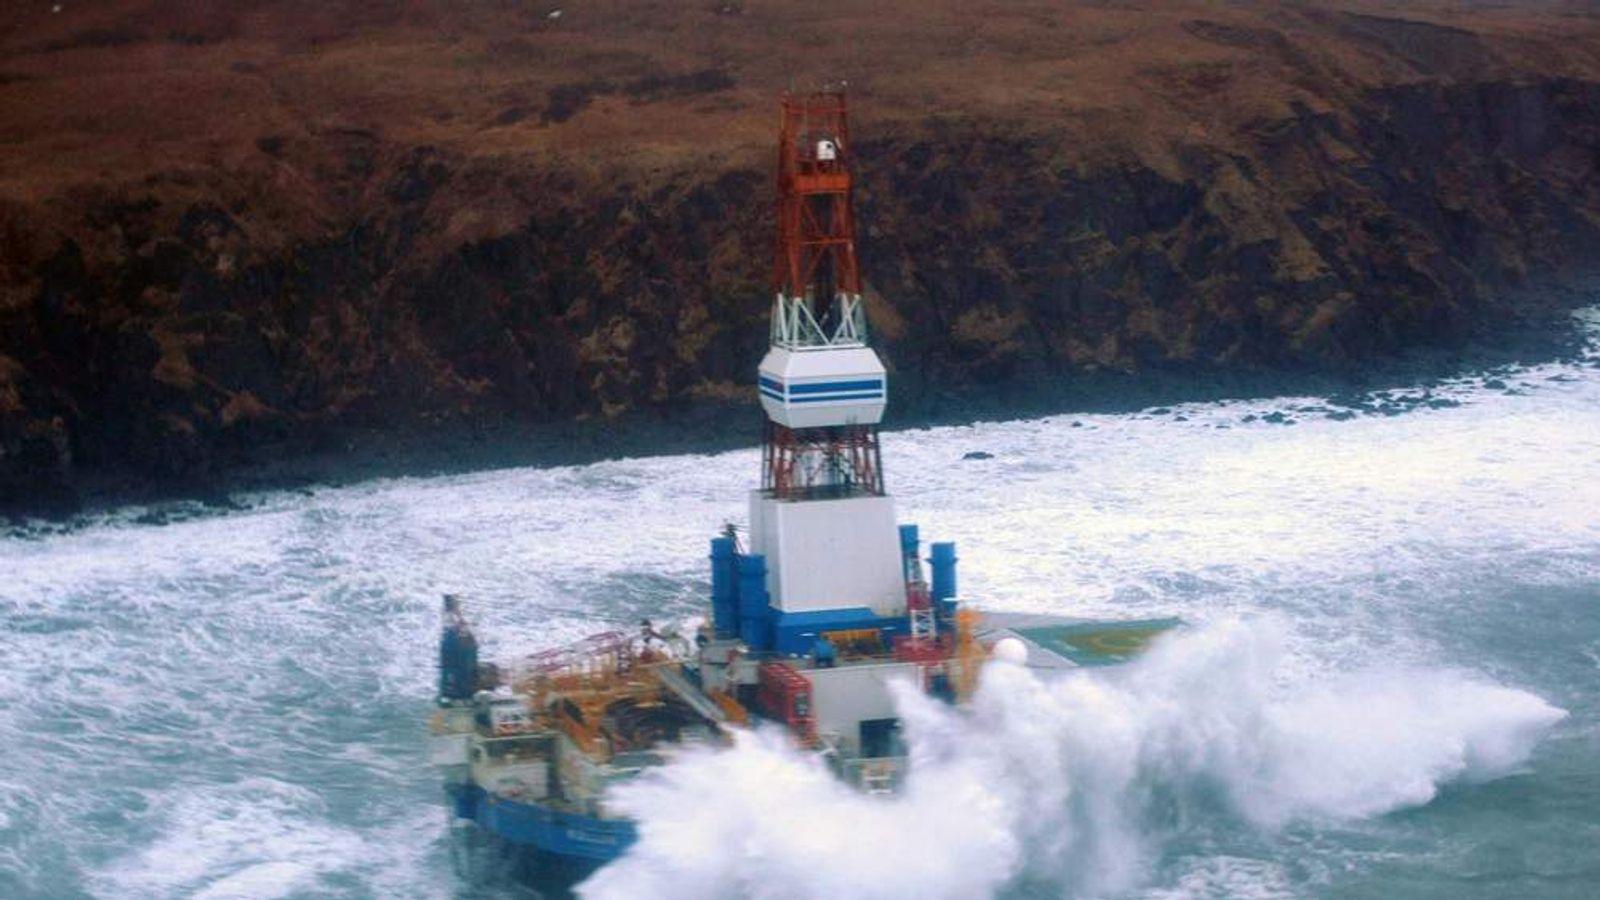 Royal Dutch Shell drilling rig Kulluk